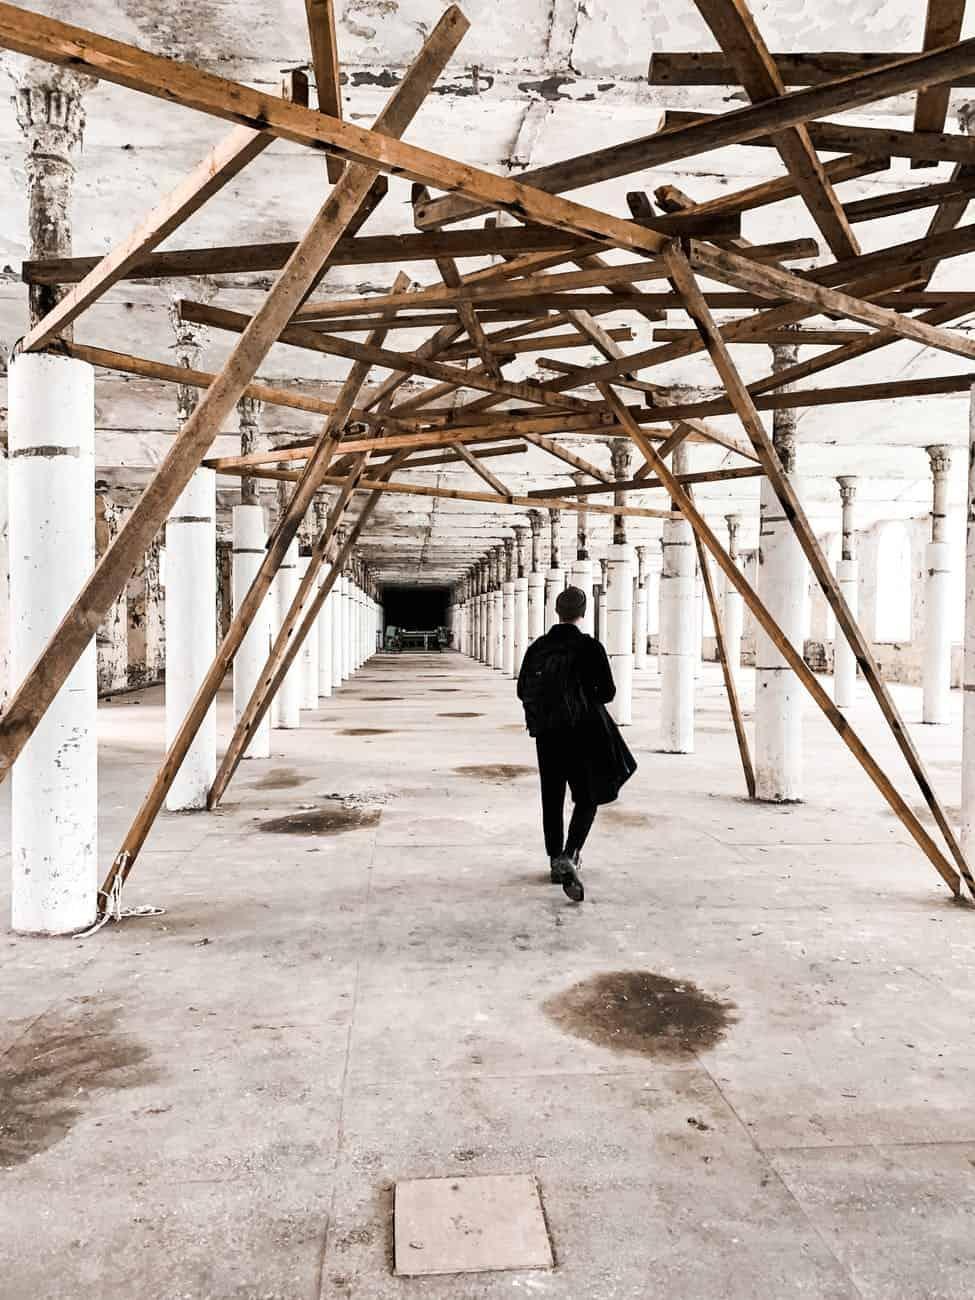 unrecognizable man walking in building corridor under reconstruction